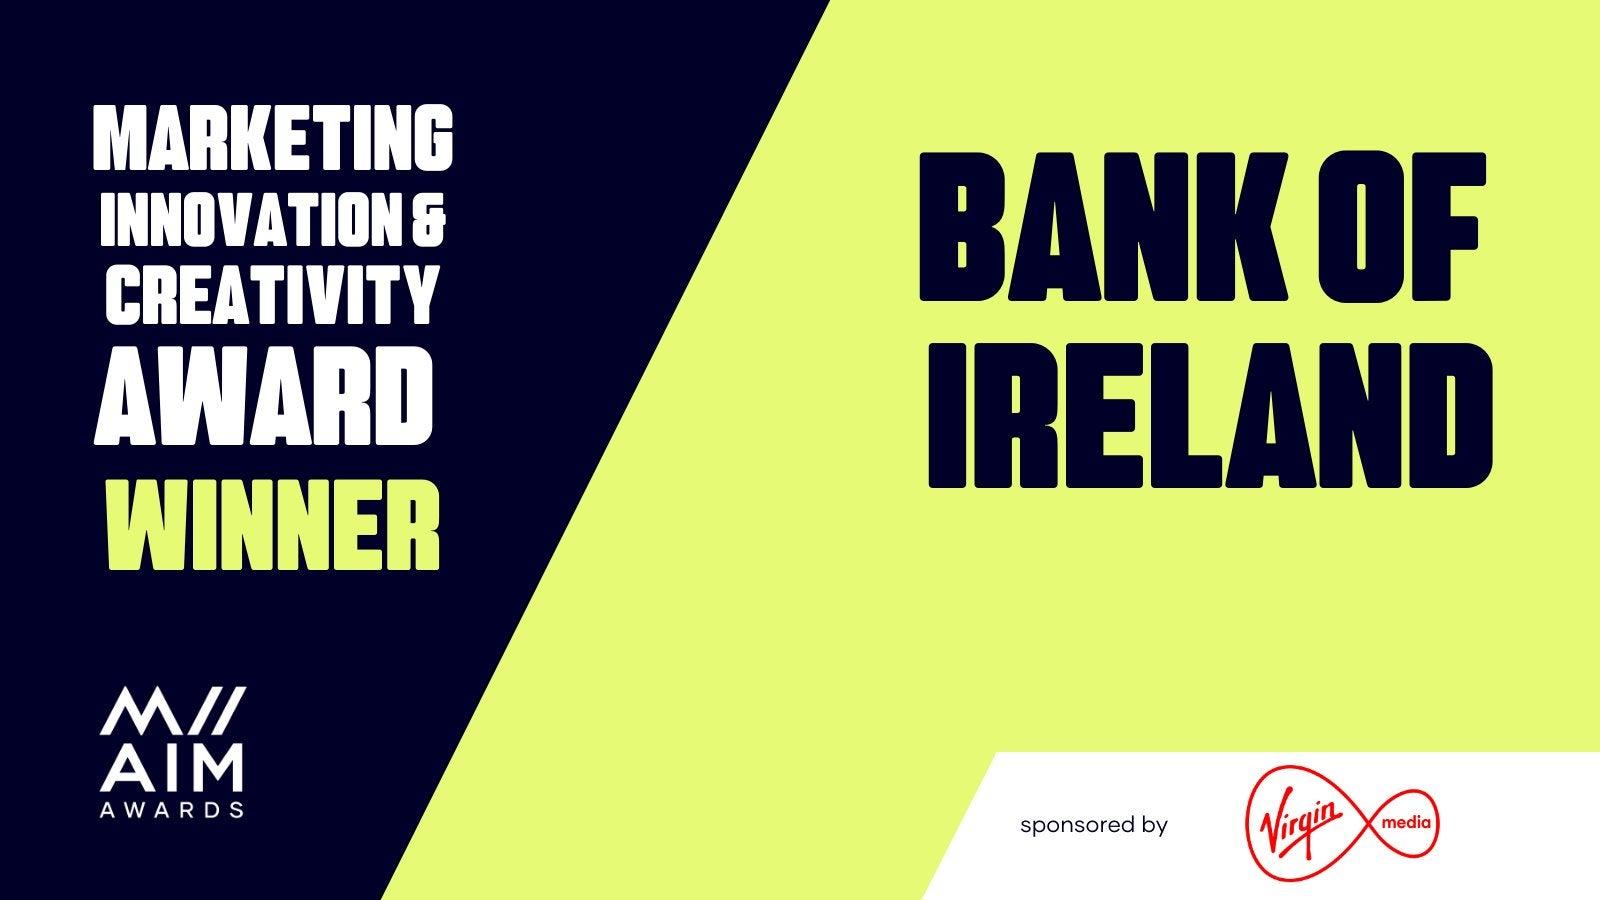 Bank of Ireland Social media asset for winning the marketing innovation and creativity award at the all Ireland marketing awards